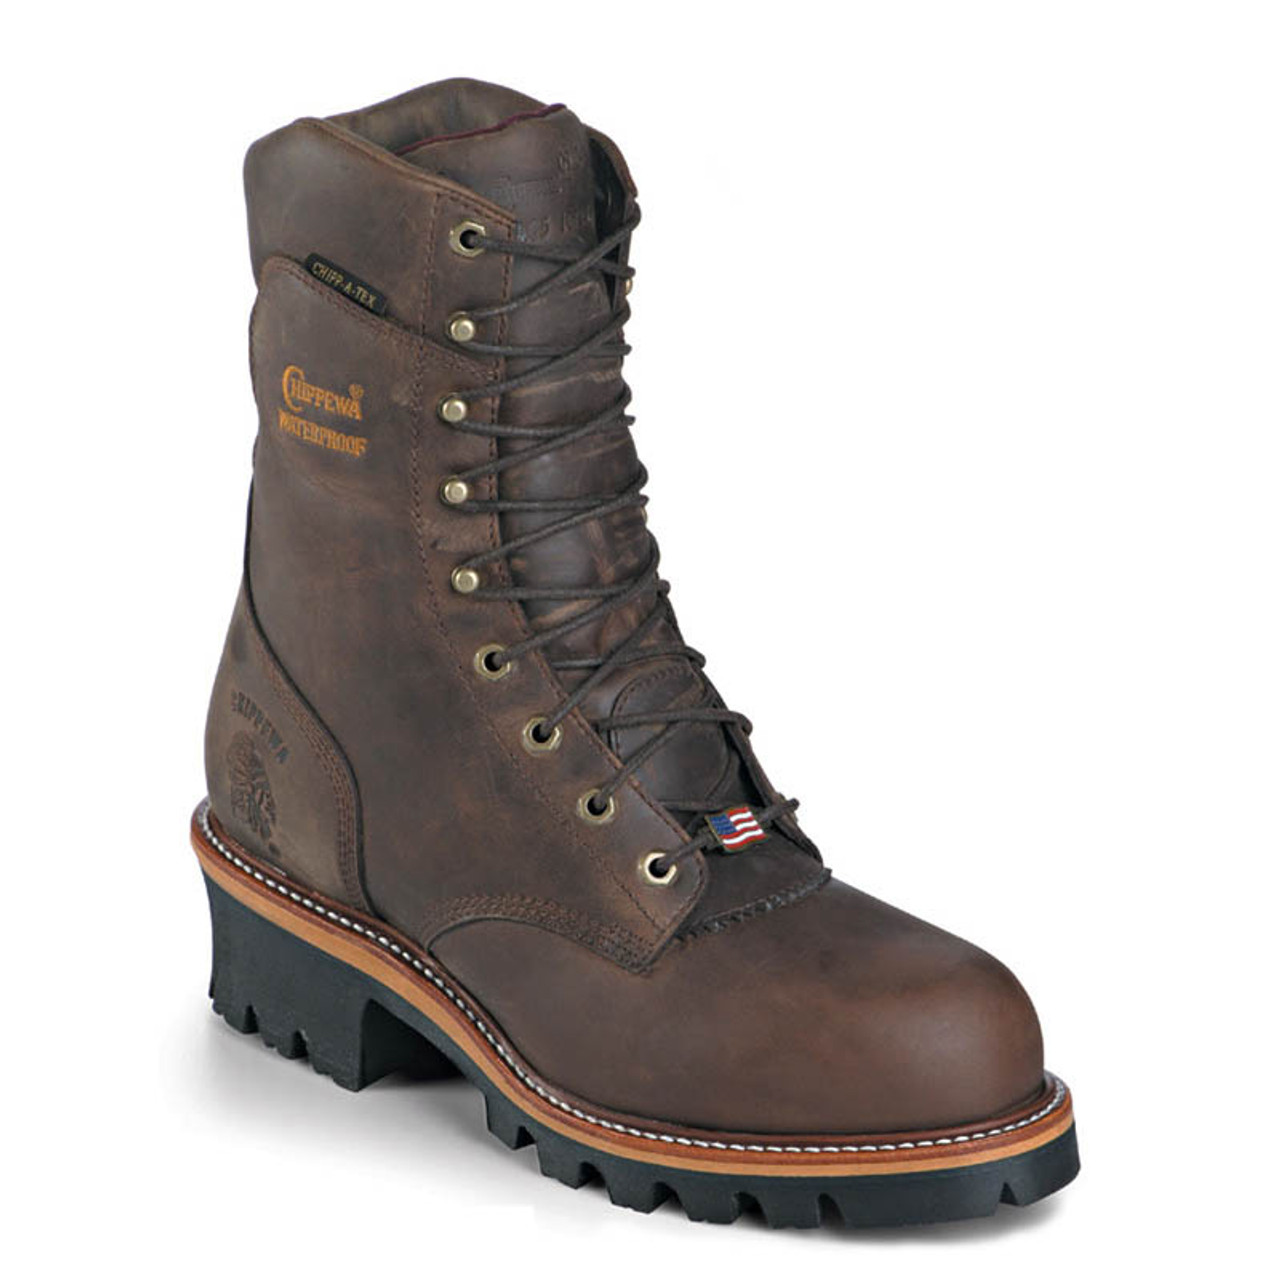 70a0bd4180f Chippewa 25408 USA ARADOR Soft Toe 400g Insulated Super Logger Boots